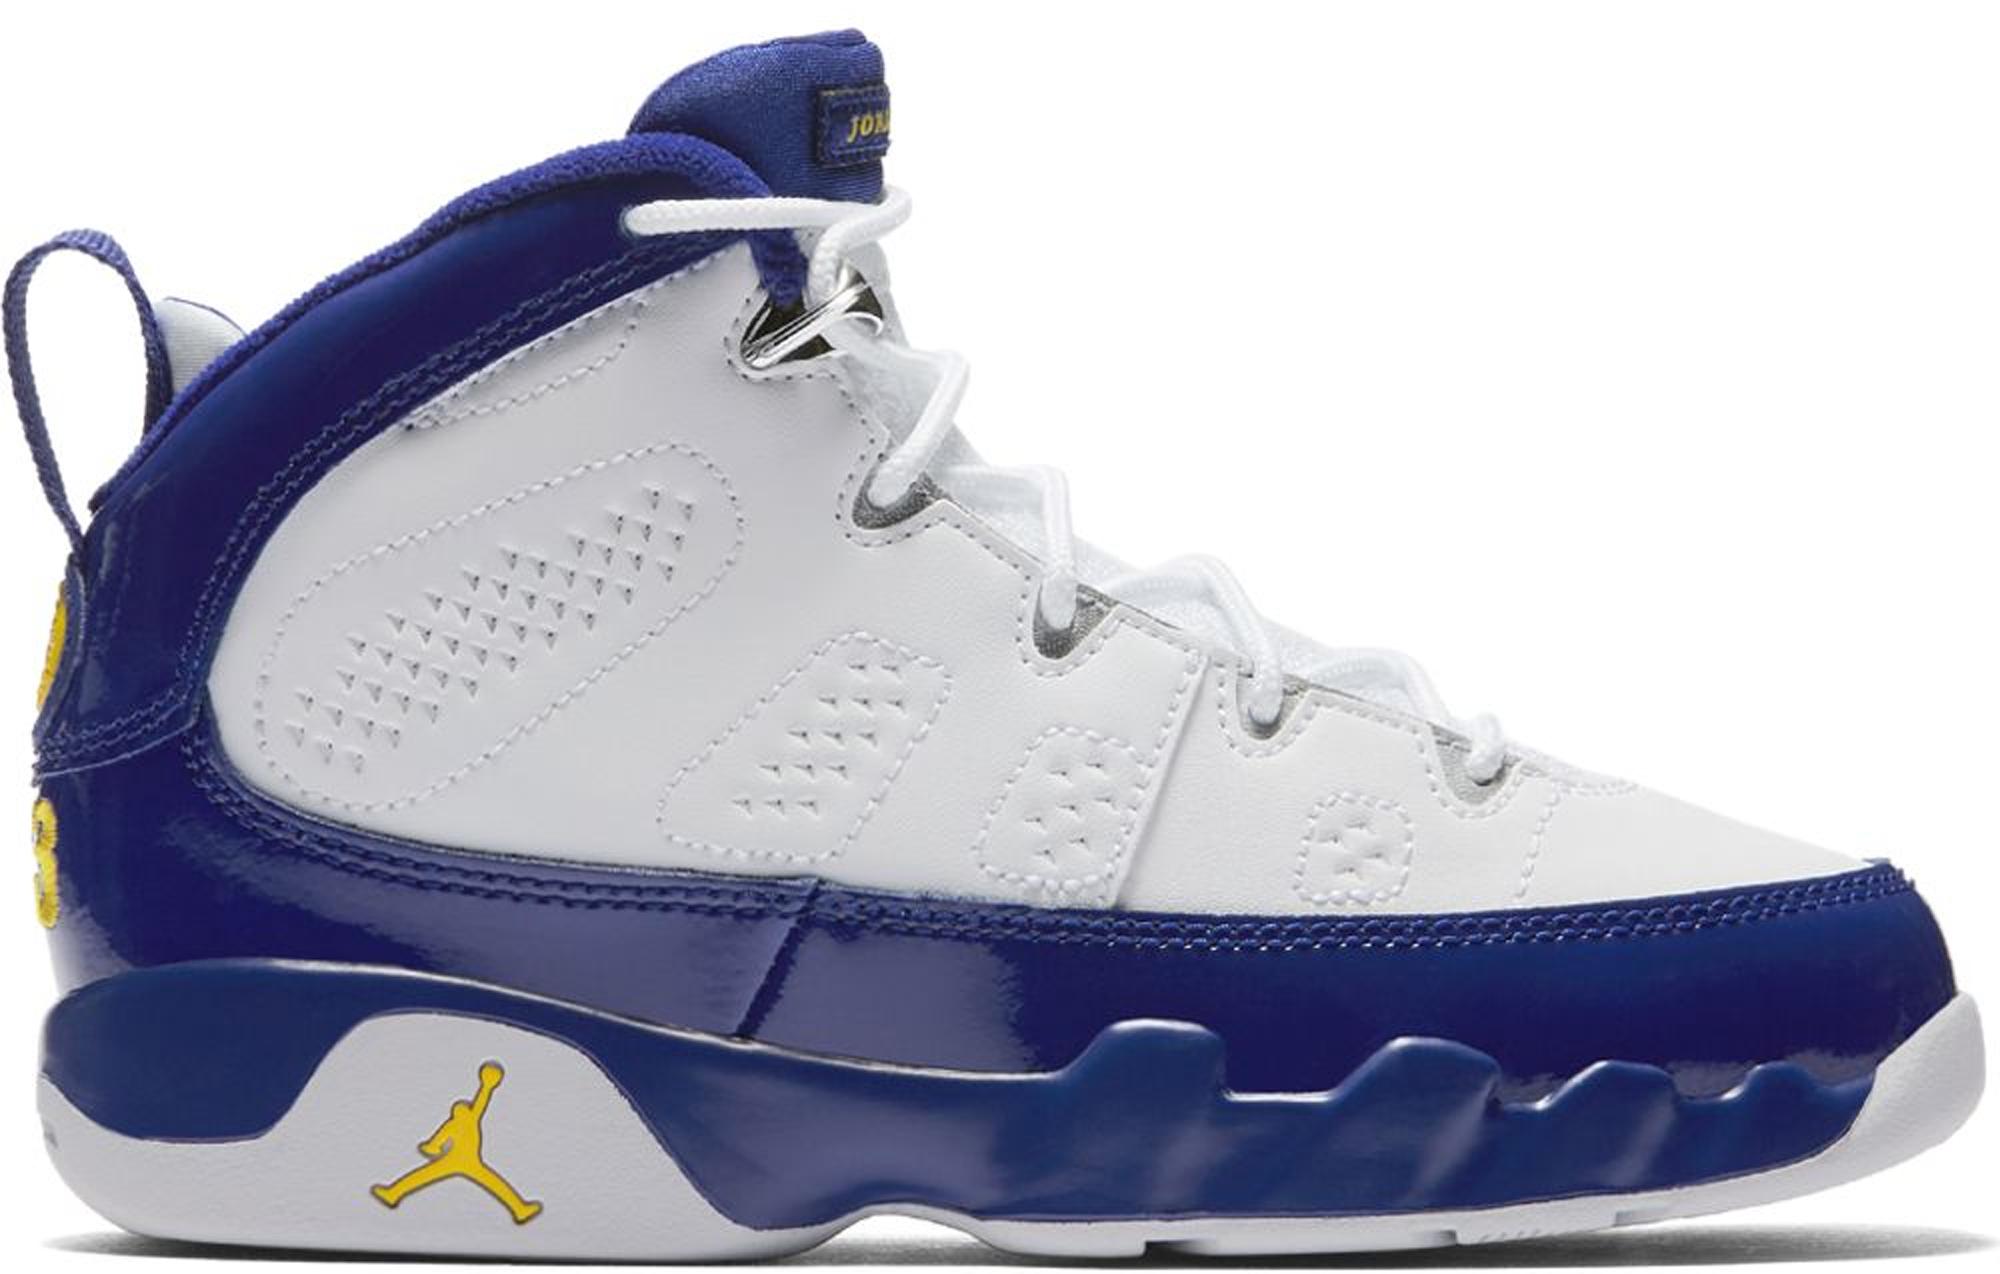 Jordan 9 Retro Kobe Bryant PE (PS)